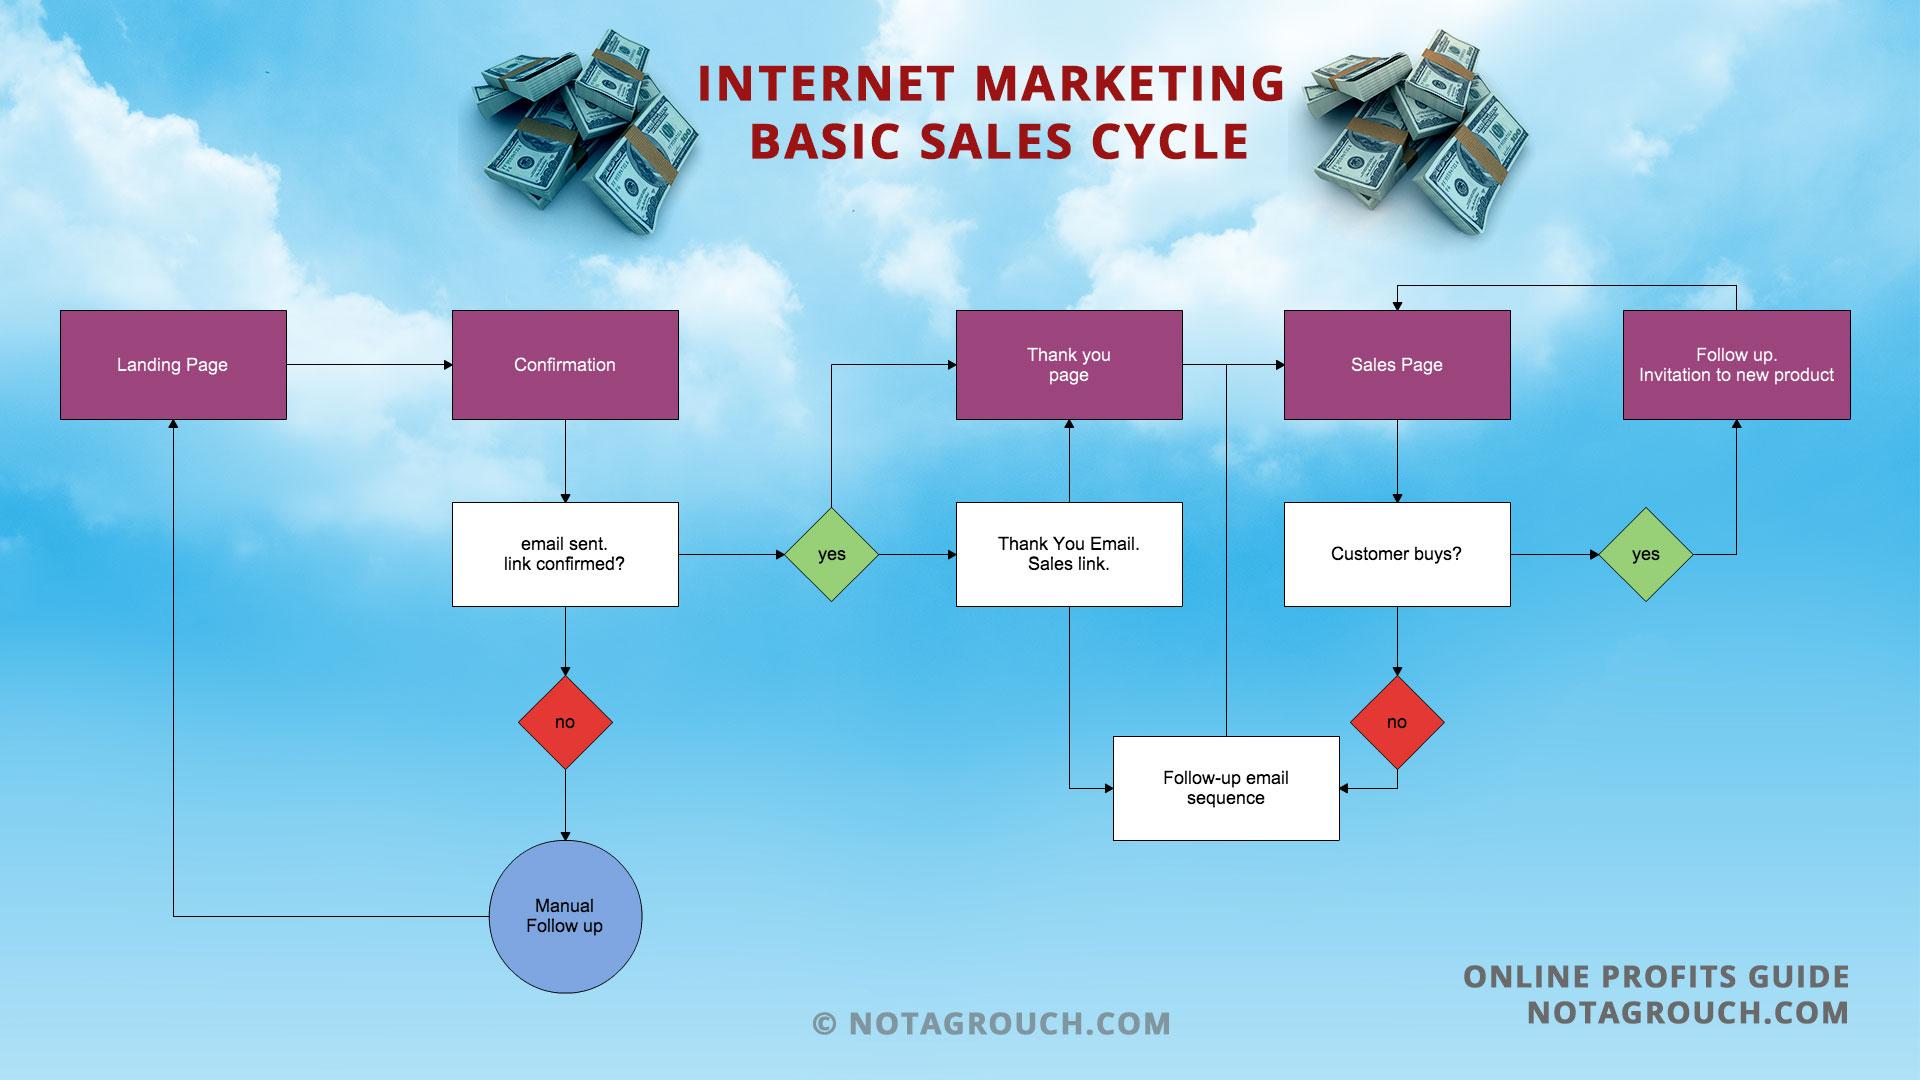 The internet marketing basic sales flowchart